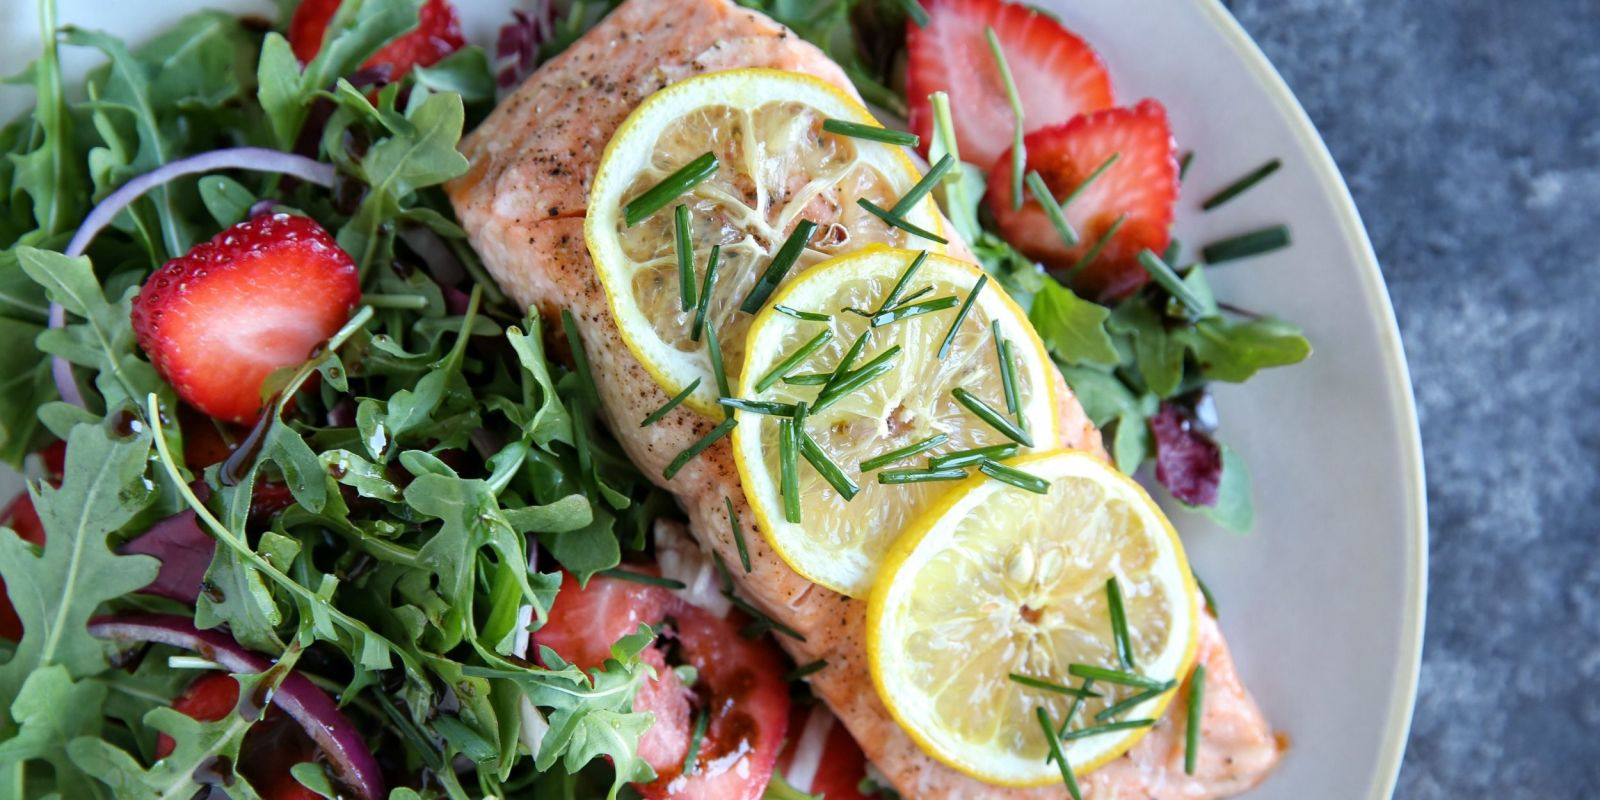 13 Best Arugula Salad Recipes Easy Arugula Salads Delish Com Watermelon Wallpaper Rainbow Find Free HD for Desktop [freshlhys.tk]